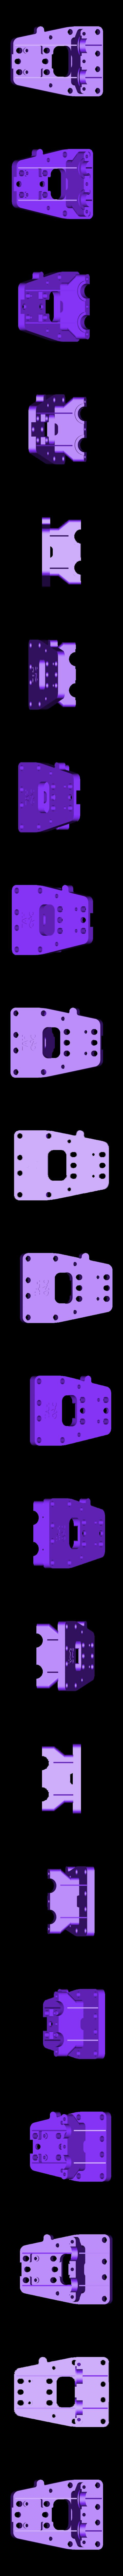 Dual01.STL Télécharger fichier STL gratuit Upgraded X-carriage for Sunhokey Prusa i3 - Integrated fans, 20mm extra Z-range and PiBot optical height sensor. • Objet pour imprimante 3D, tahustvedt